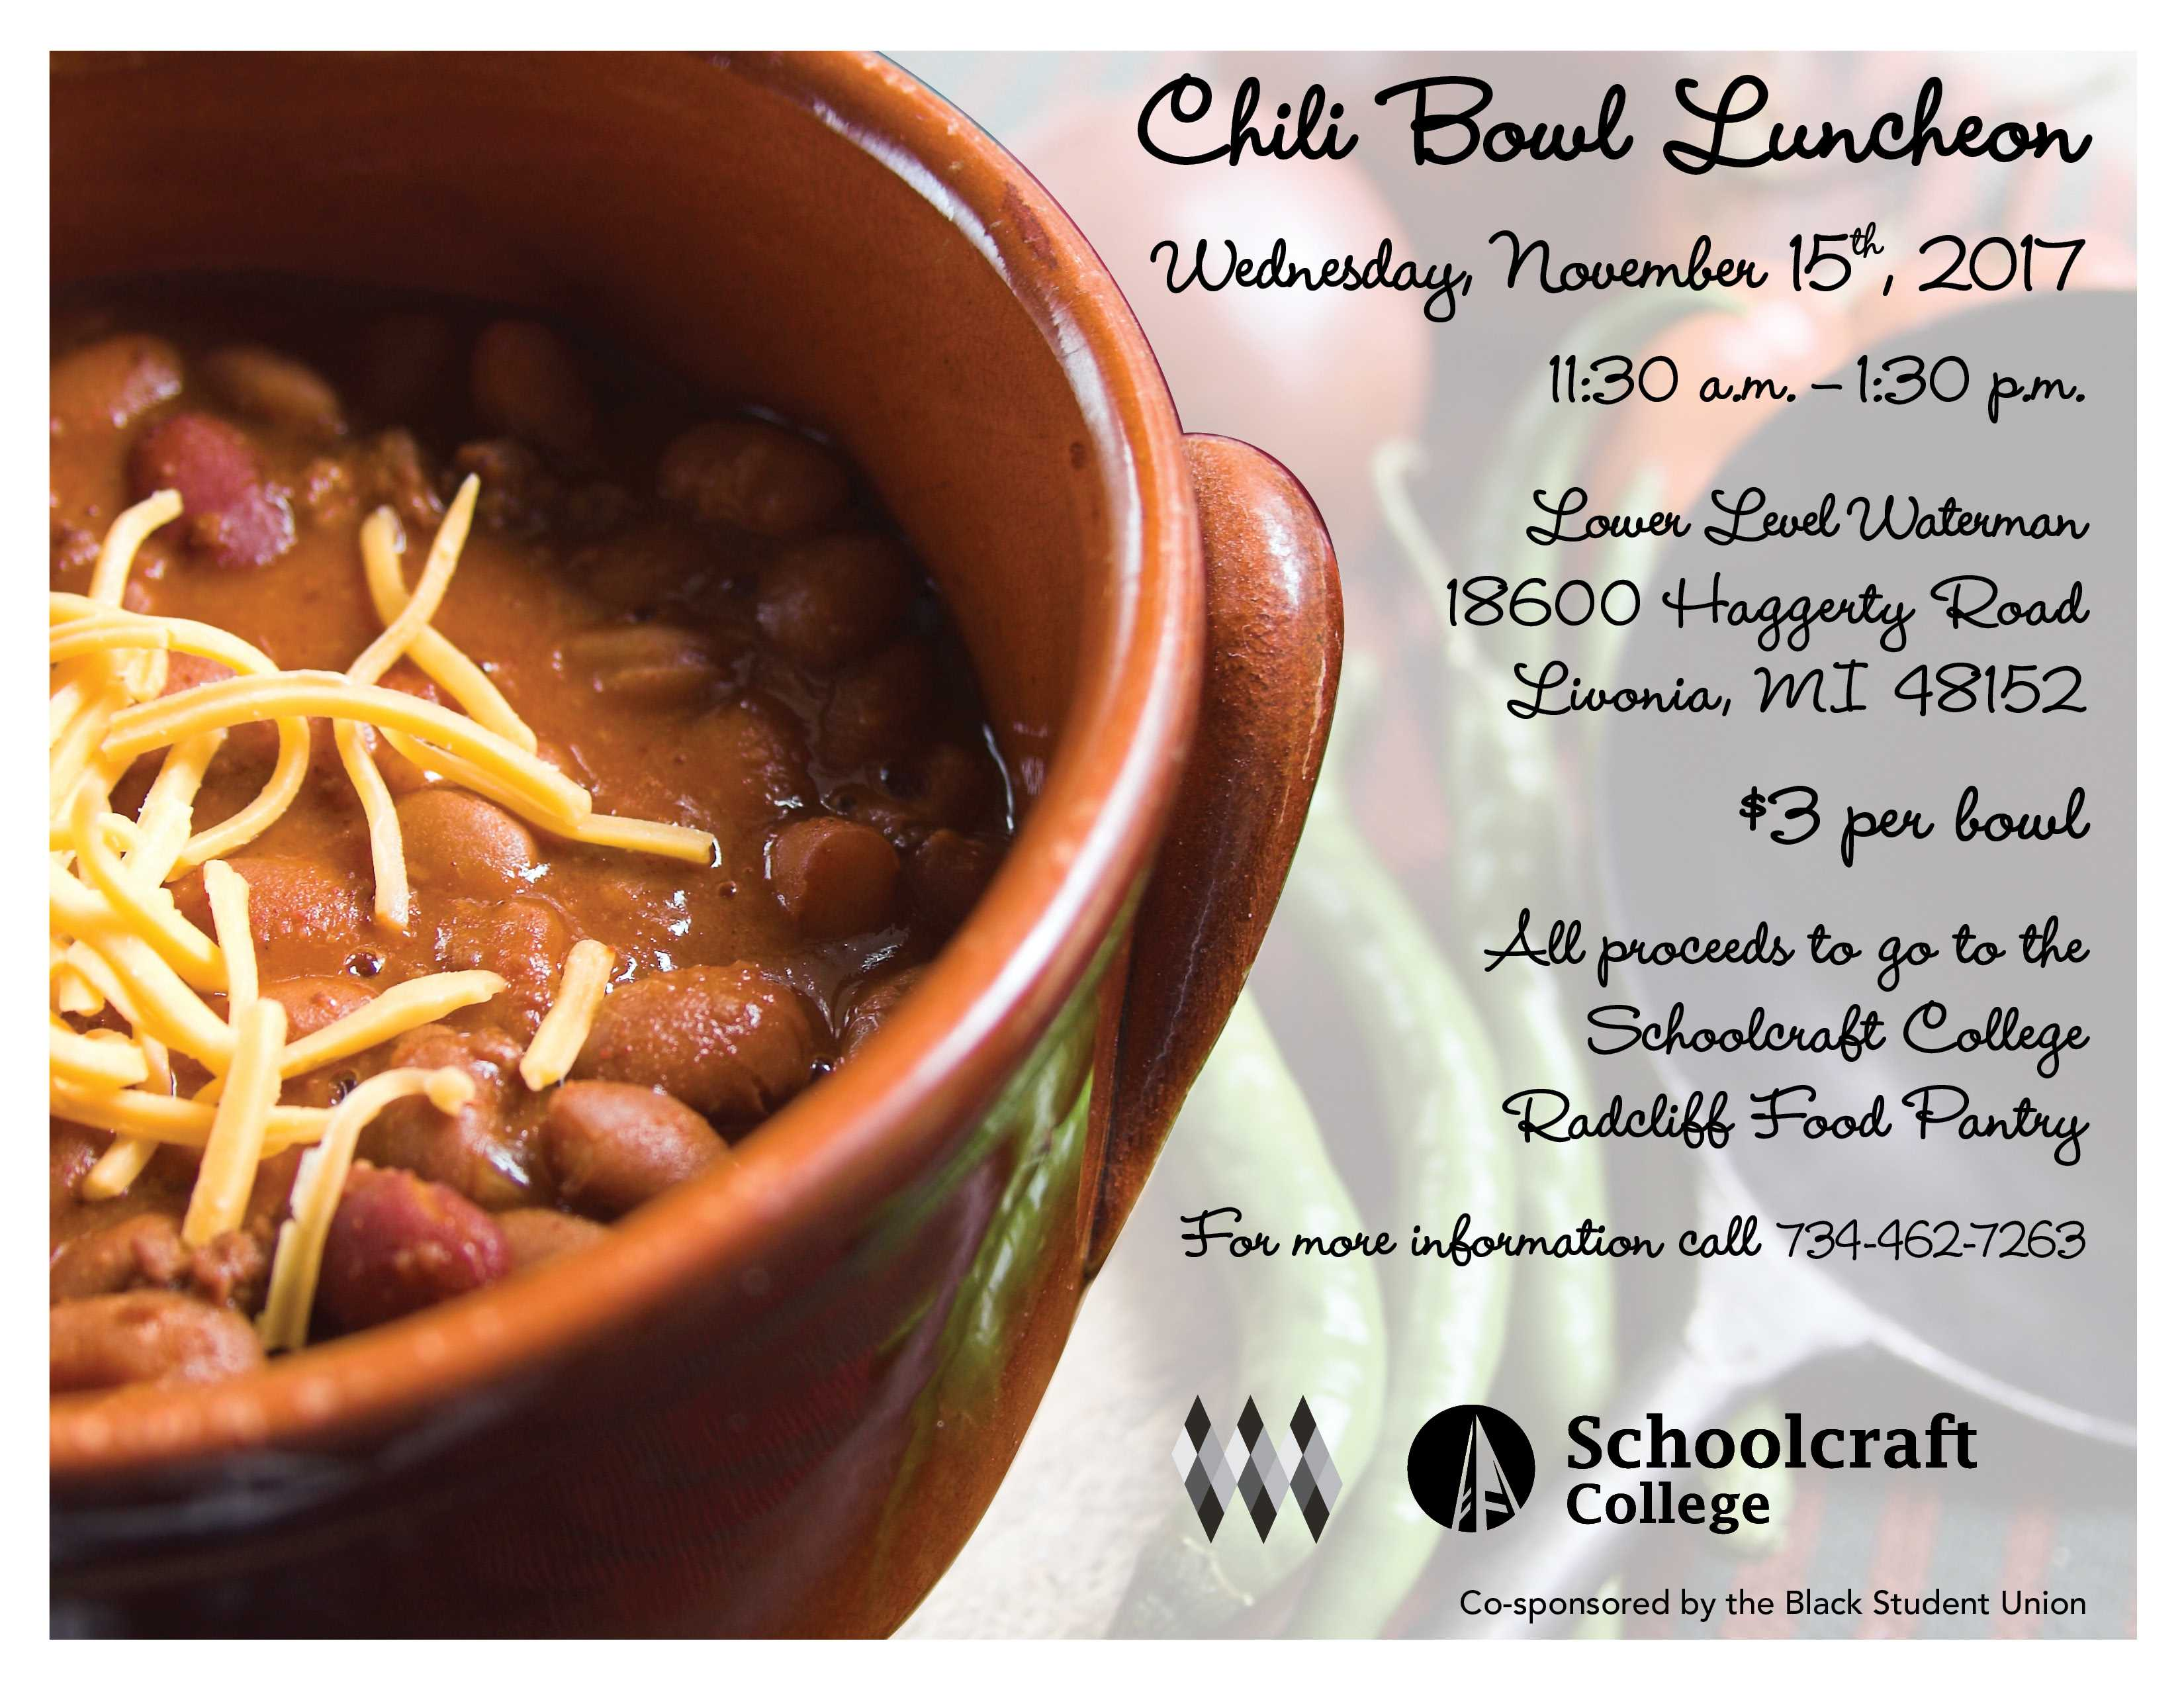 Chili-Bowl Luncheon 2017 (1)